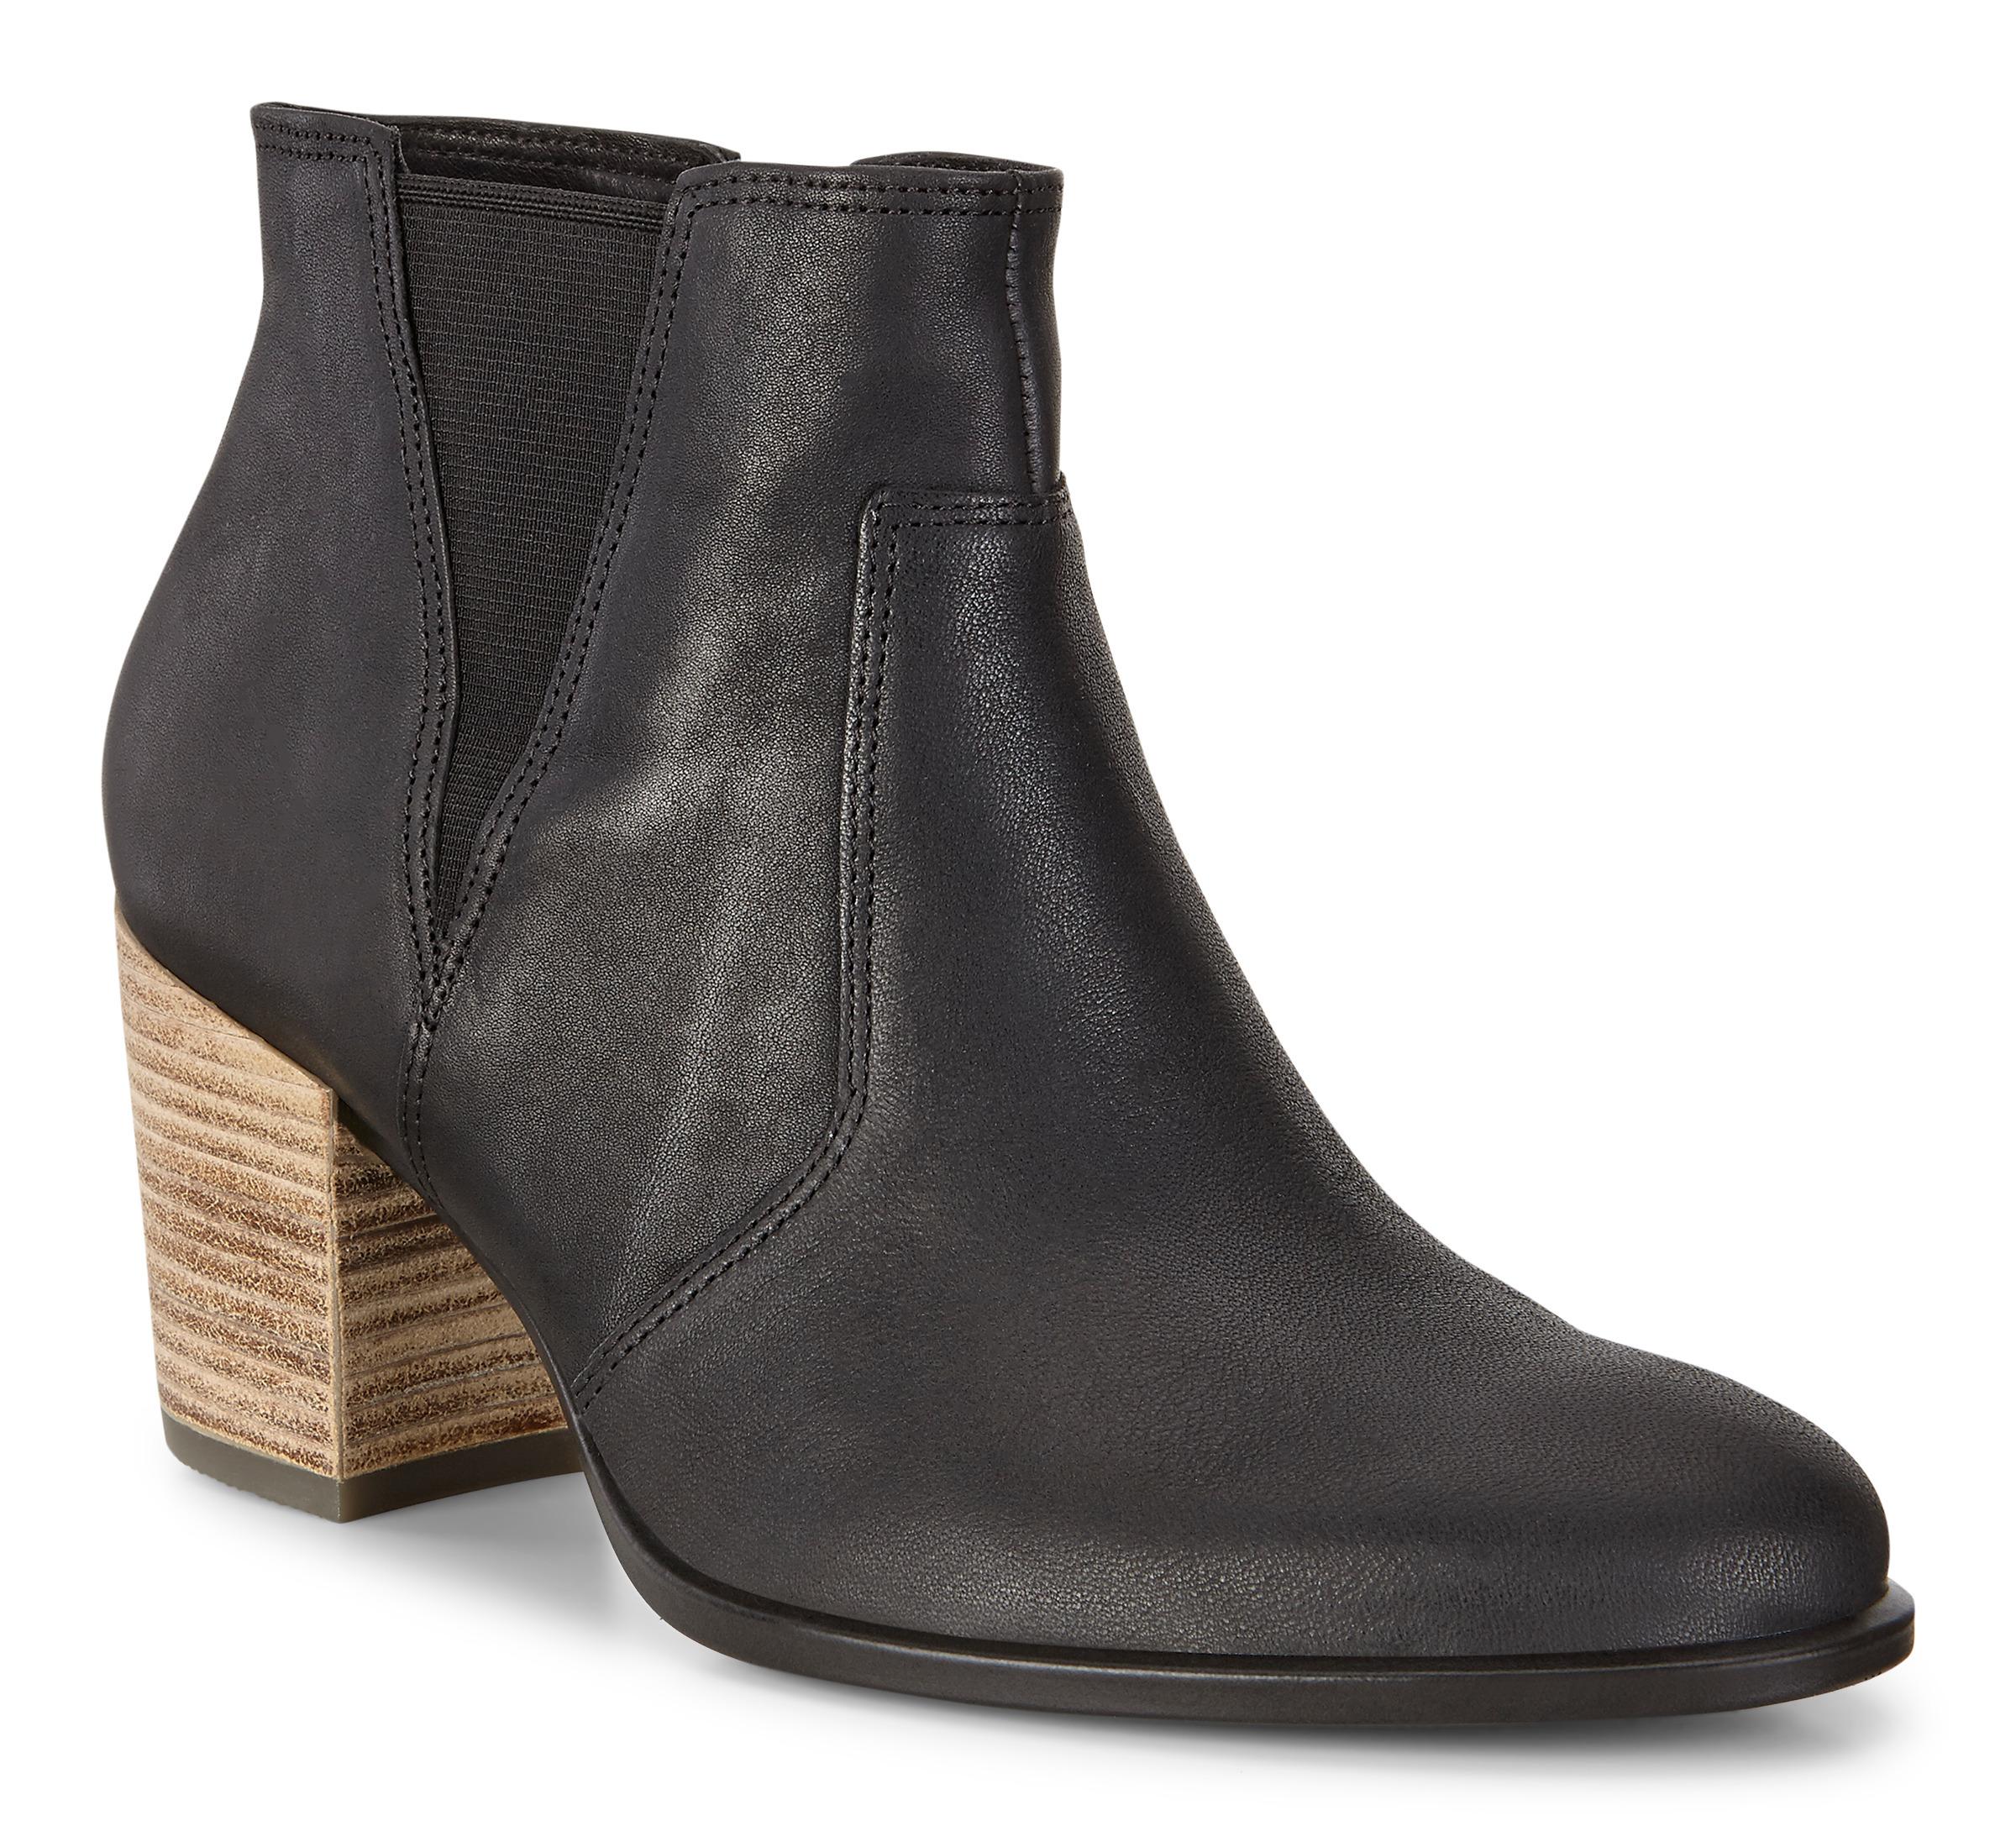 Chaussures Femmes Ecco Talons 55 Shape Sq4wTp